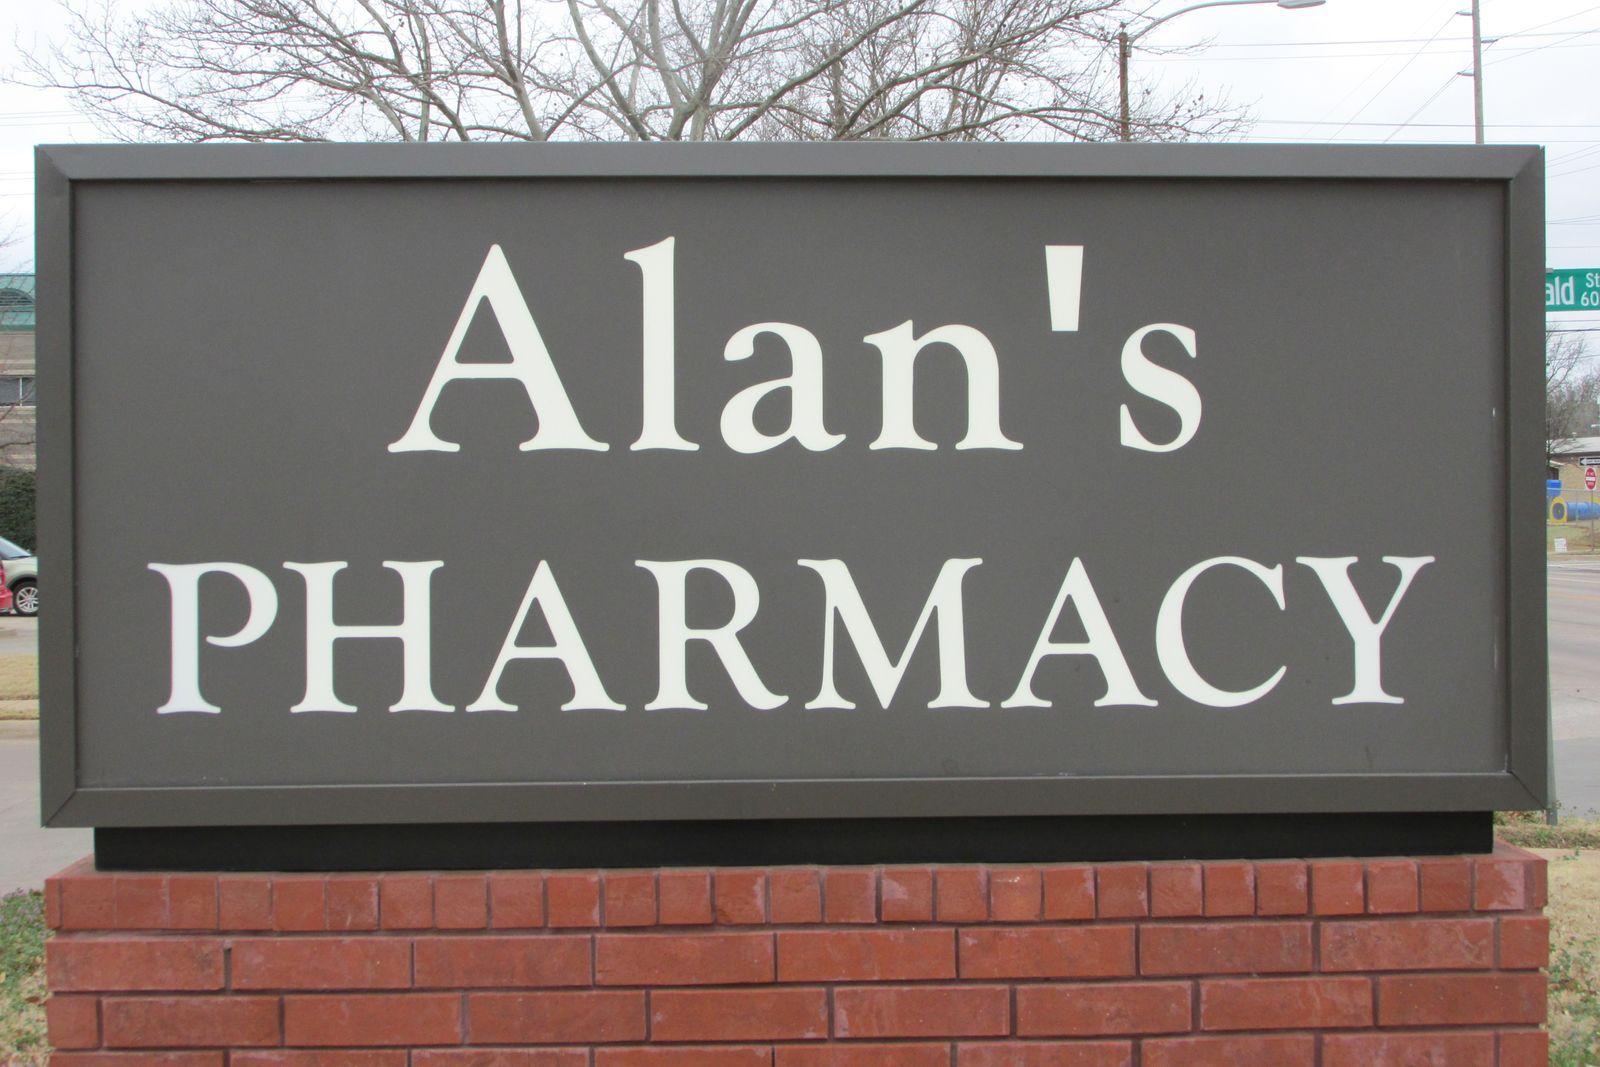 Alan's Pharmacy Outdoor Sign.jpeg